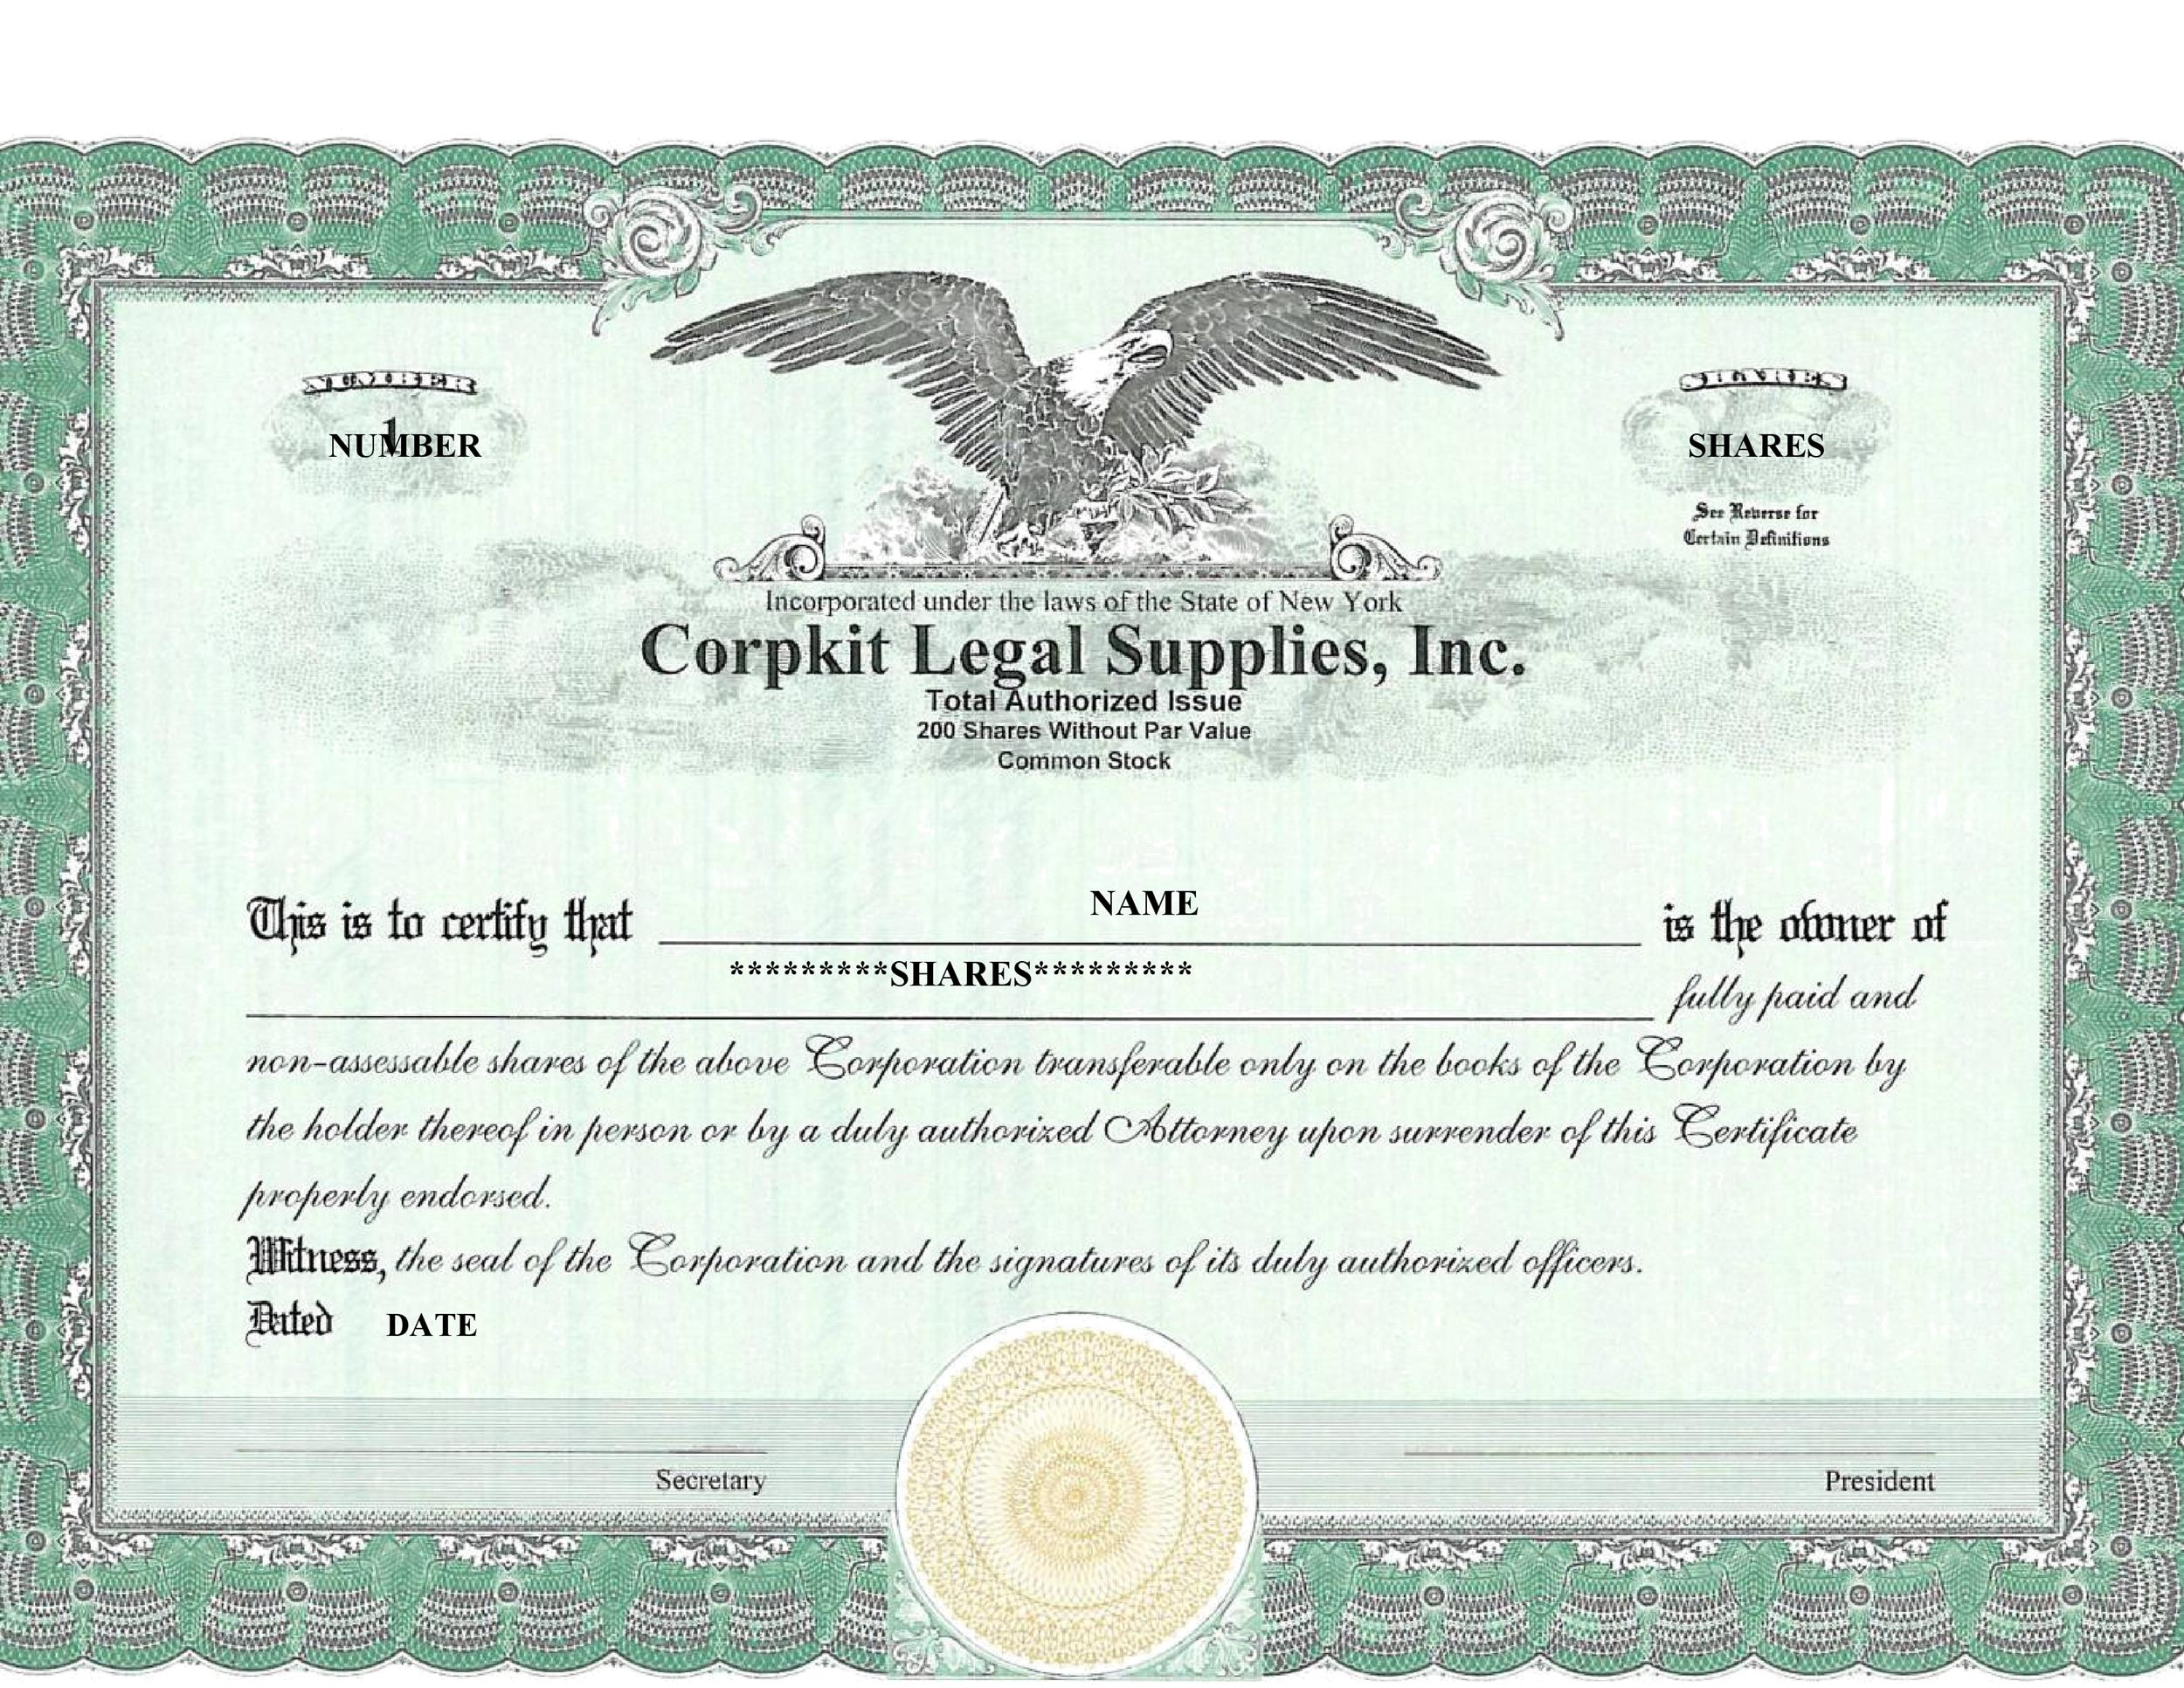 40+ Free Stock Certificate Templates (Word, PDF) - Template Lab - blank stock certificate template